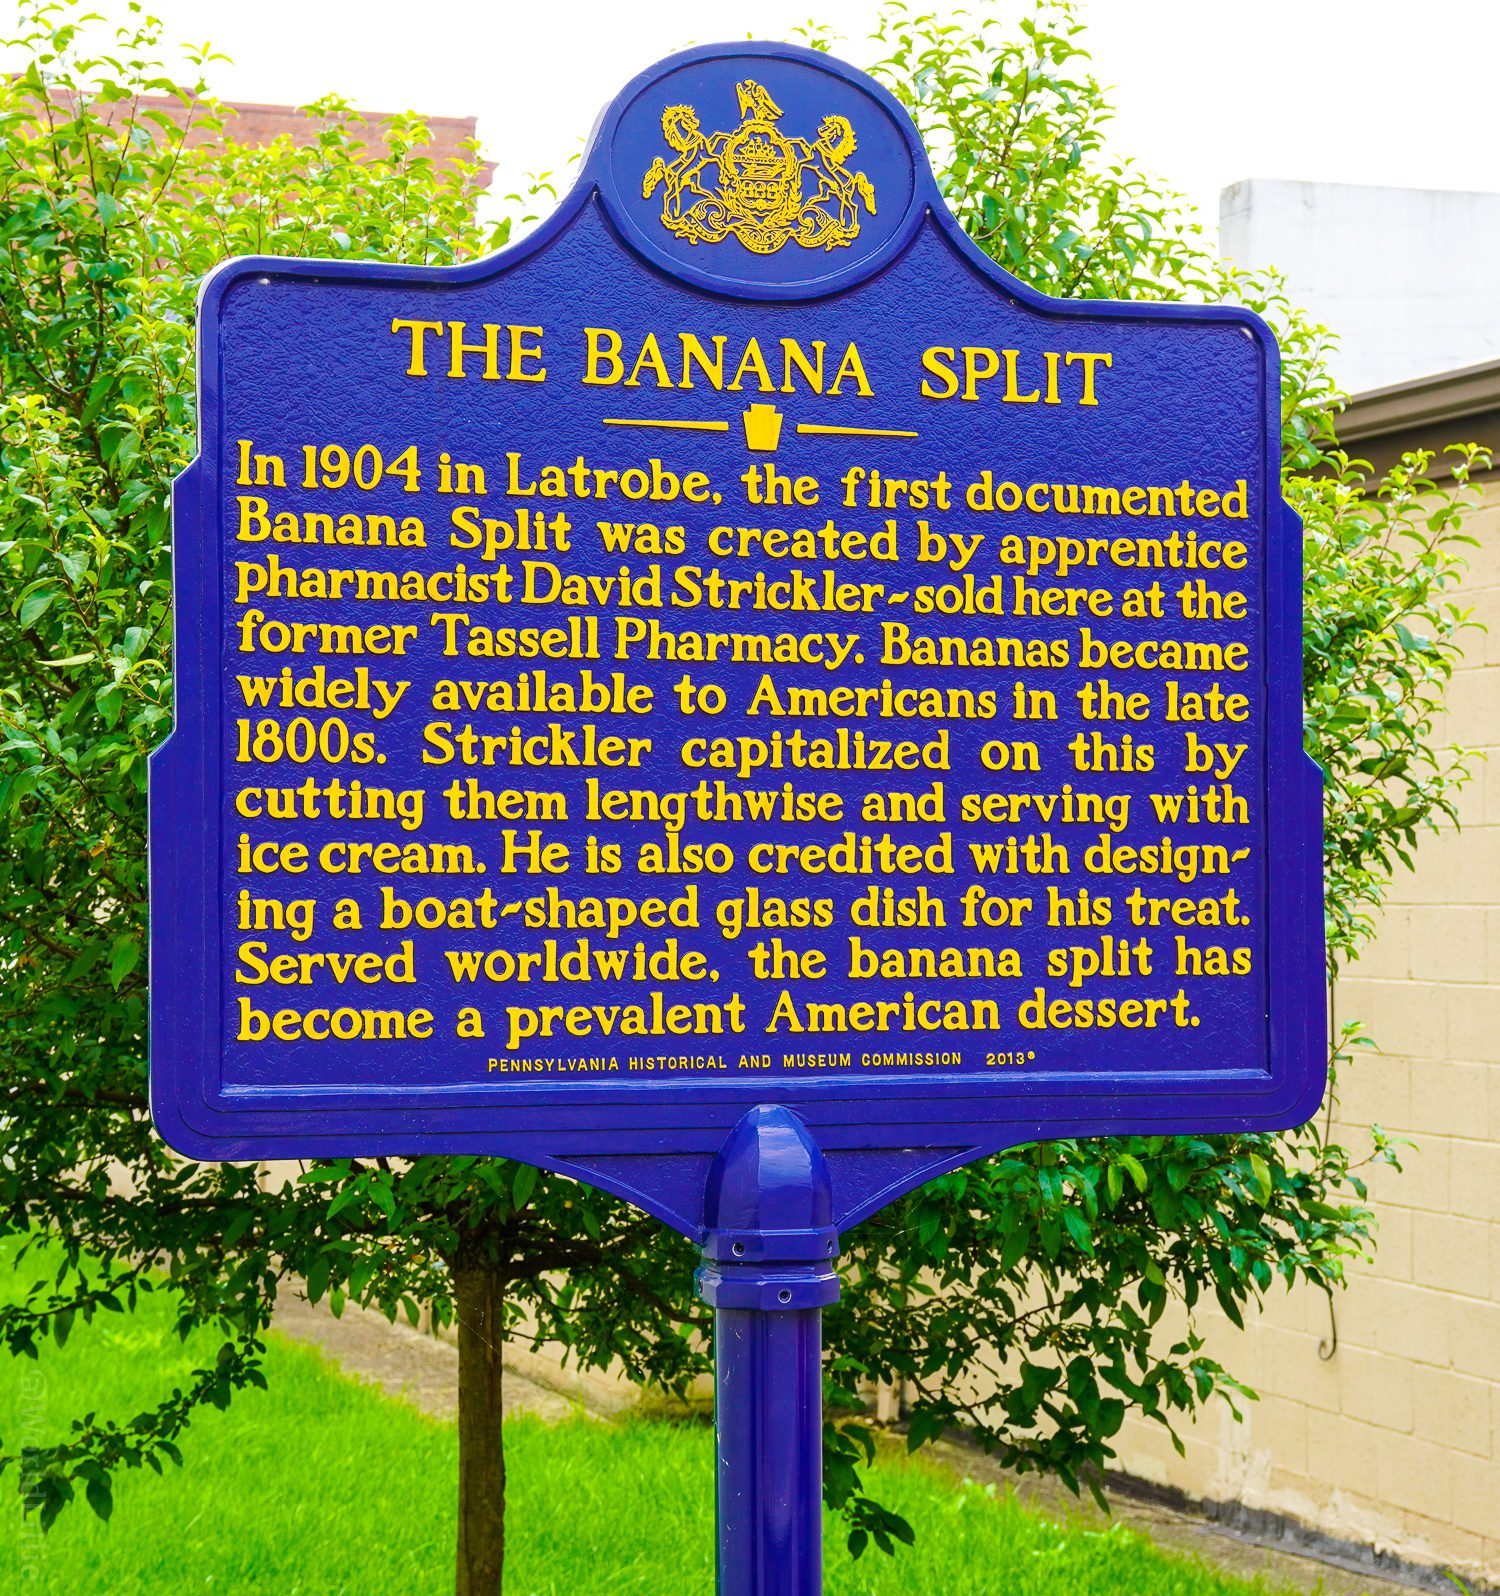 Banana Split history on a plaque.